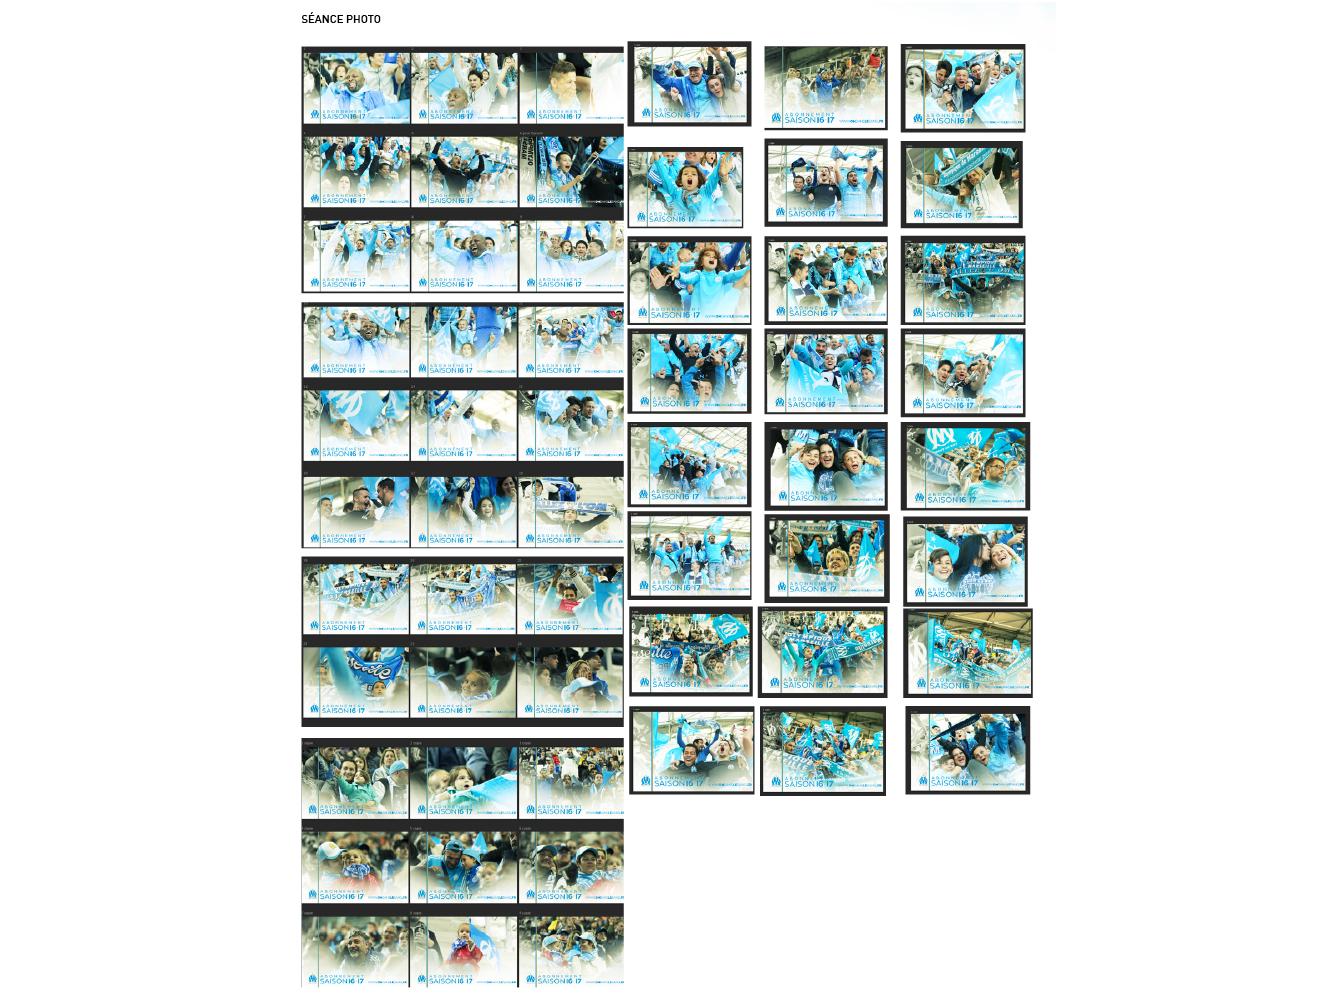 organisation et gestion seance photo campagne d'abonnement OM